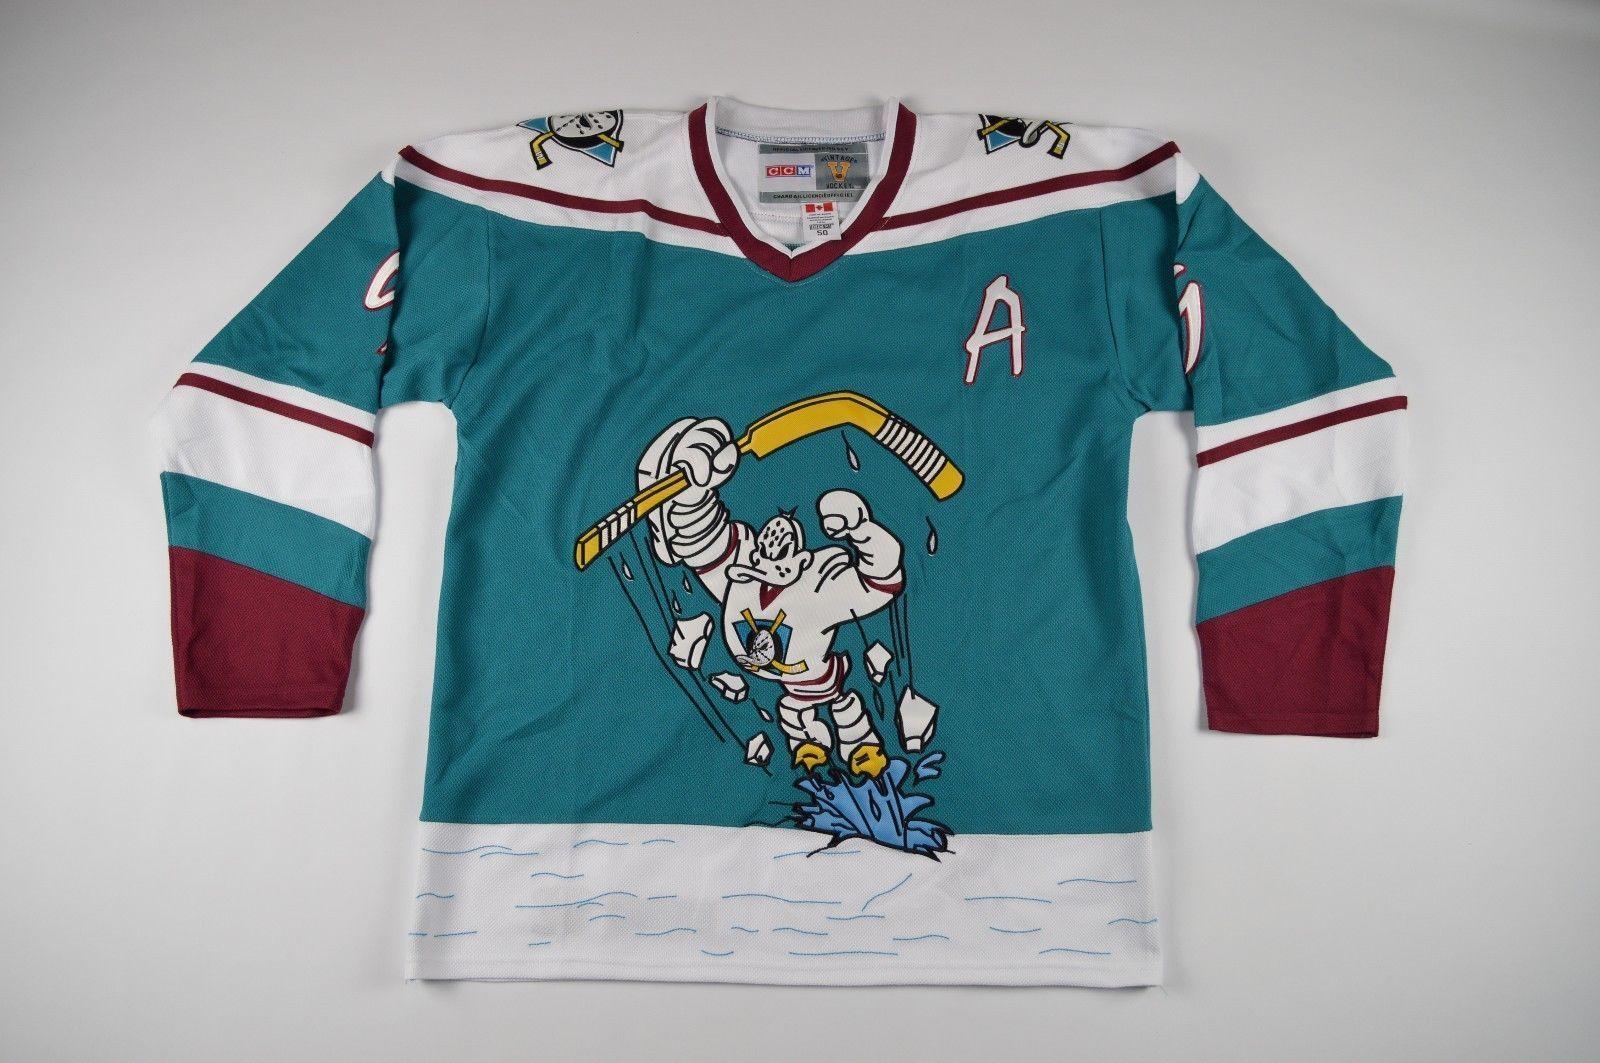 New Vintage Rare Large Anaheim Mighty Ducks Paul Kariya  9 Hockey Jersey  please retweet c3d6e3e07